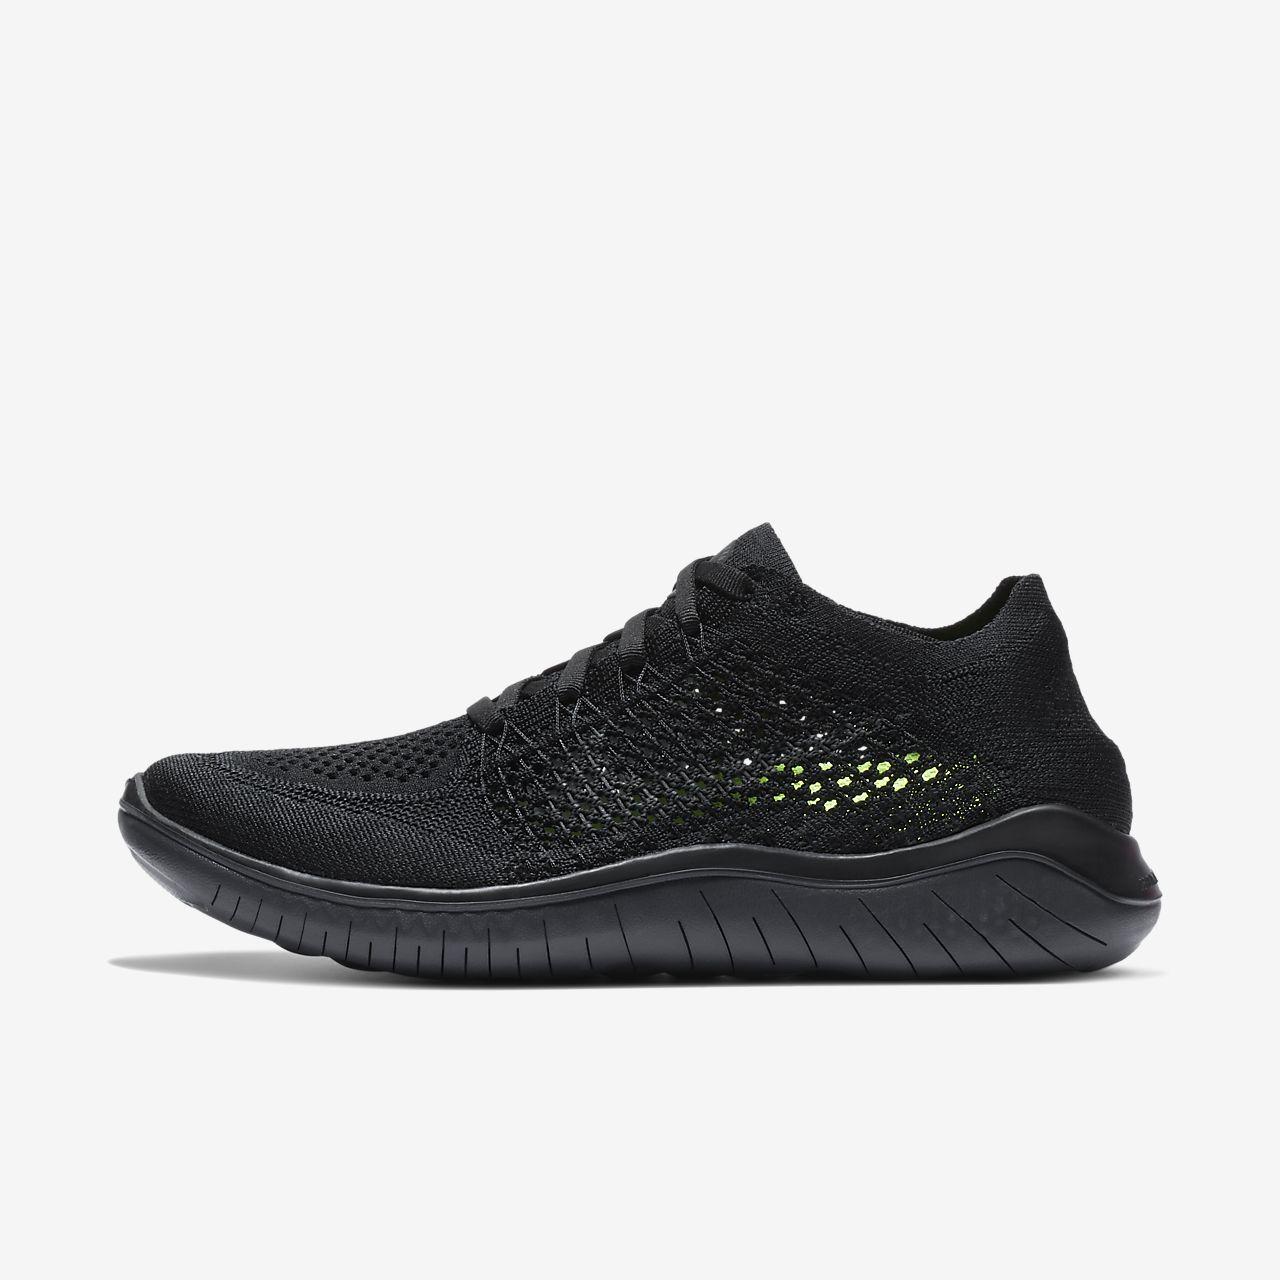 ef823252688 Nike Free RN Flyknit 2018 Women s Running Shoe. Nike.com NL